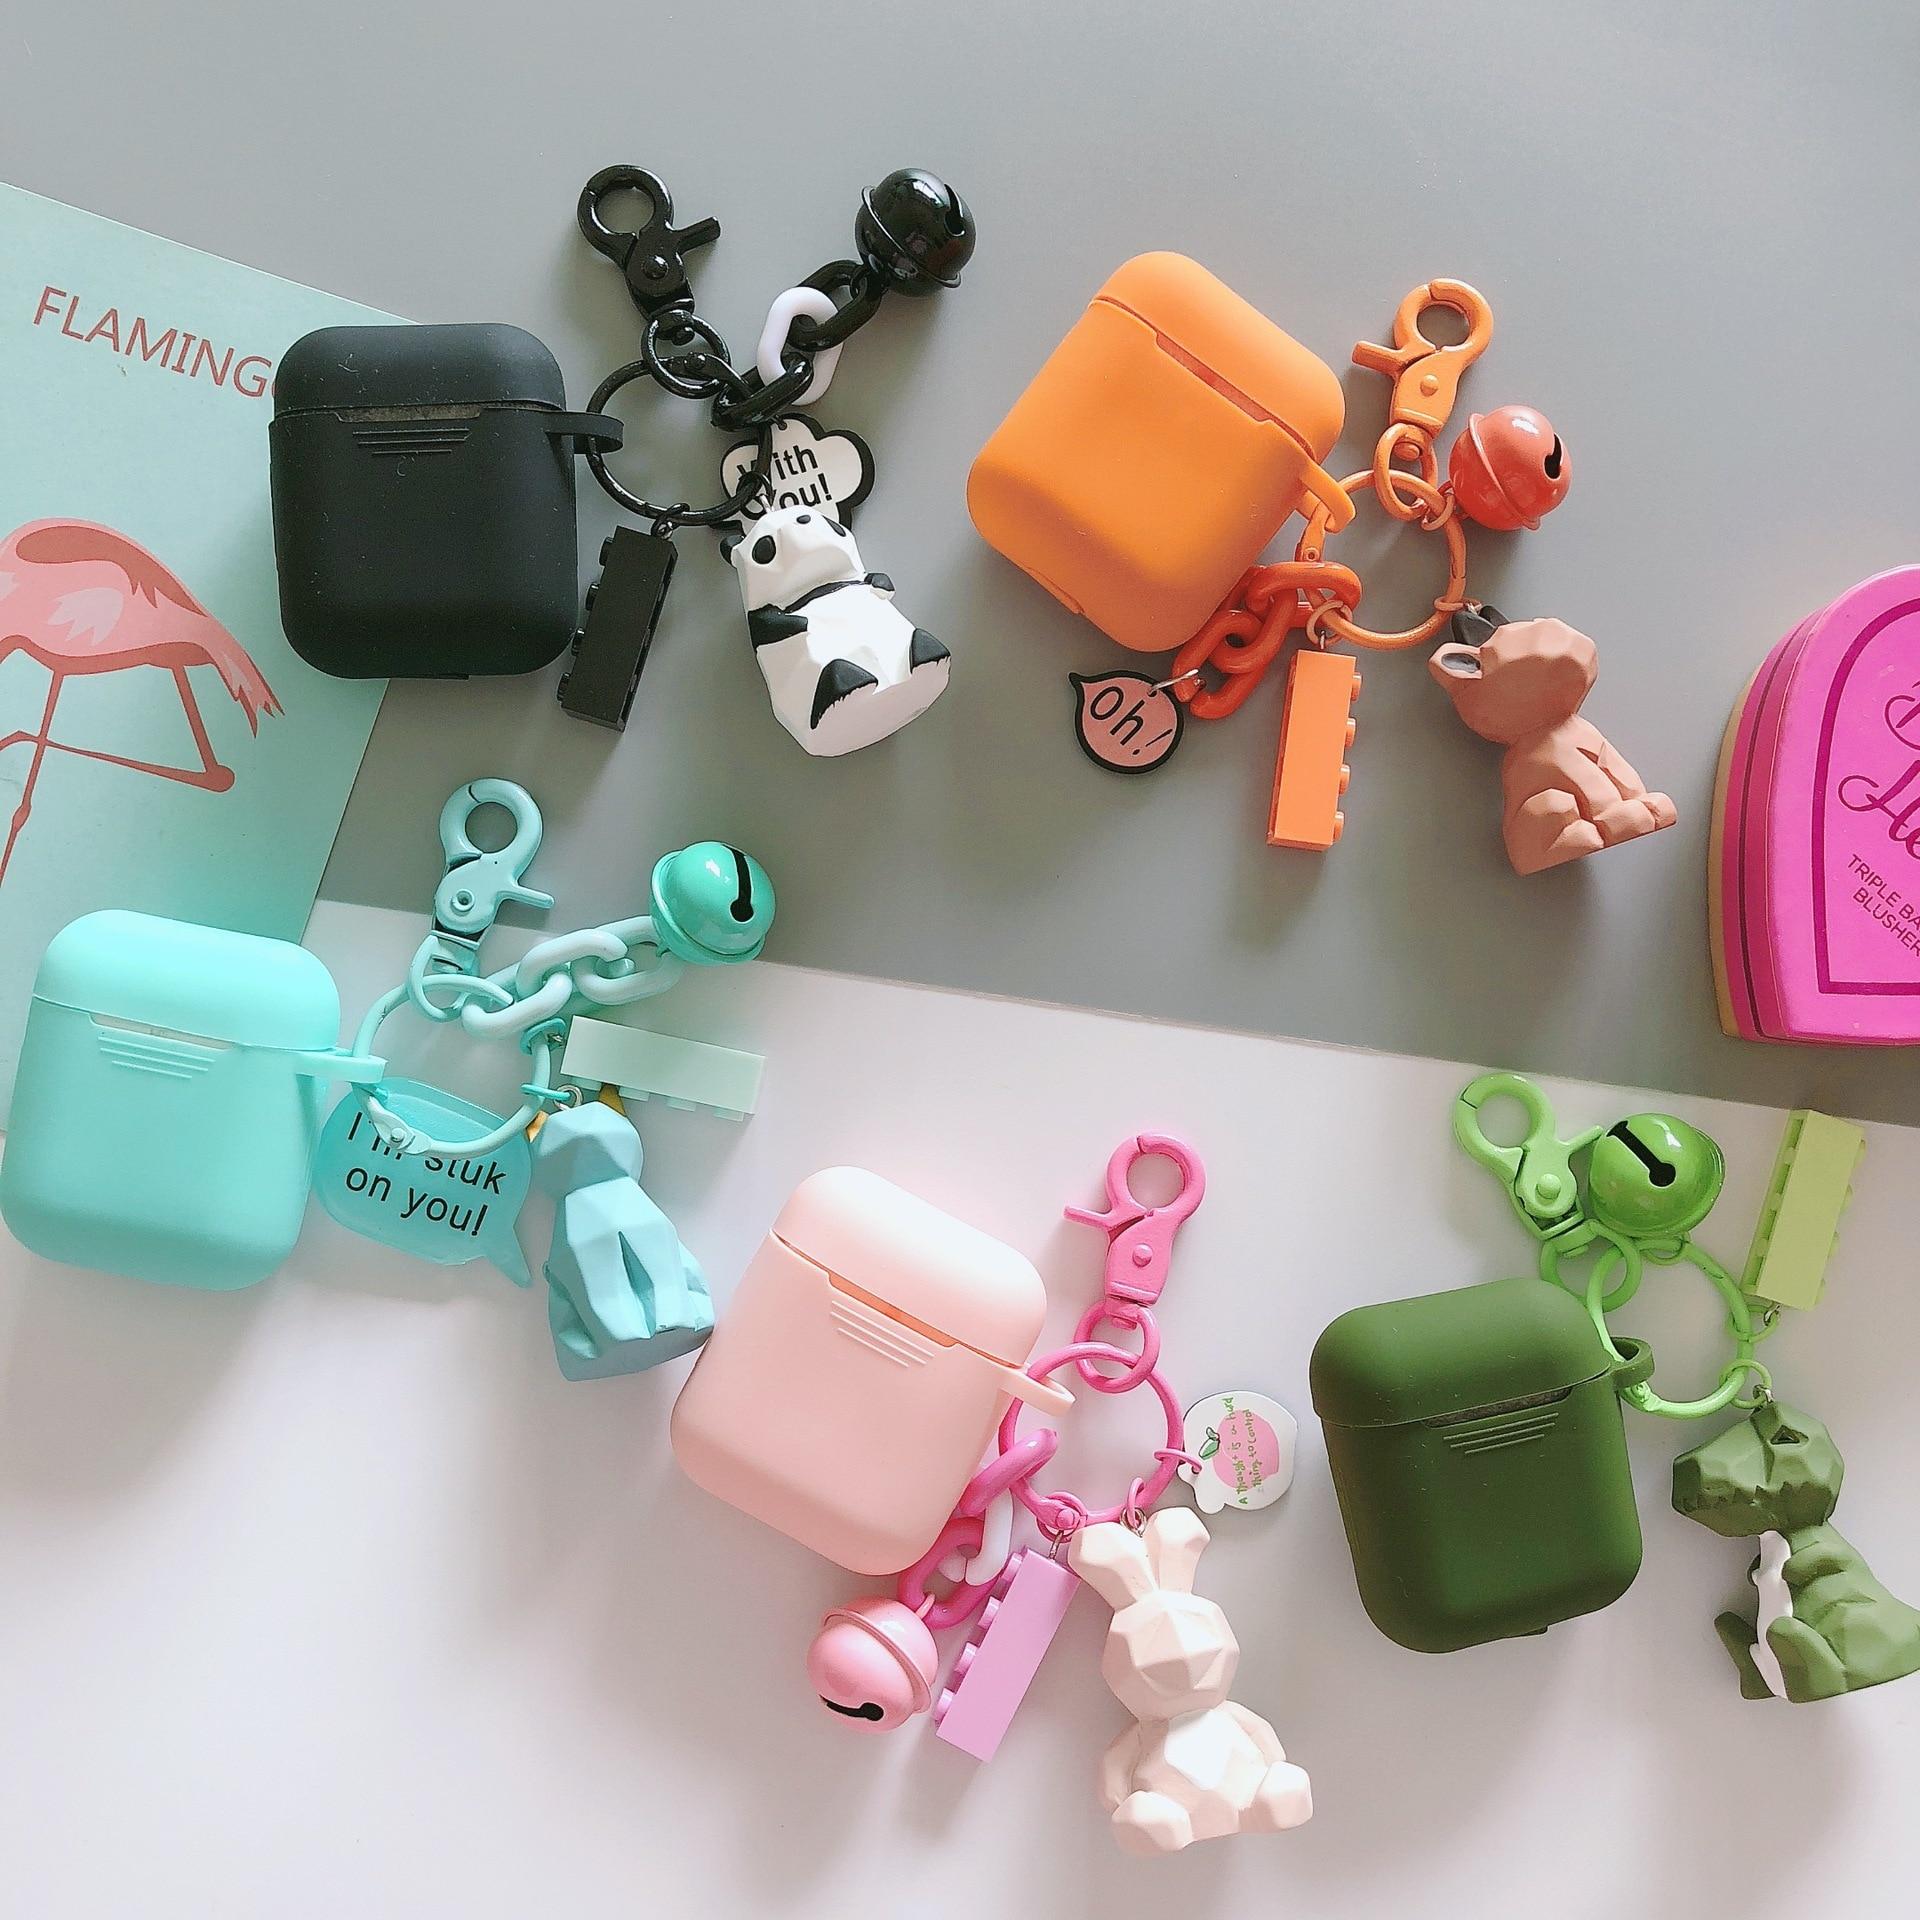 Cute Silicone dinosaur Panda Rabbit Keychain Pendant Headphone Cases For Apple Airpods 1 2 Earphone Cover Capa